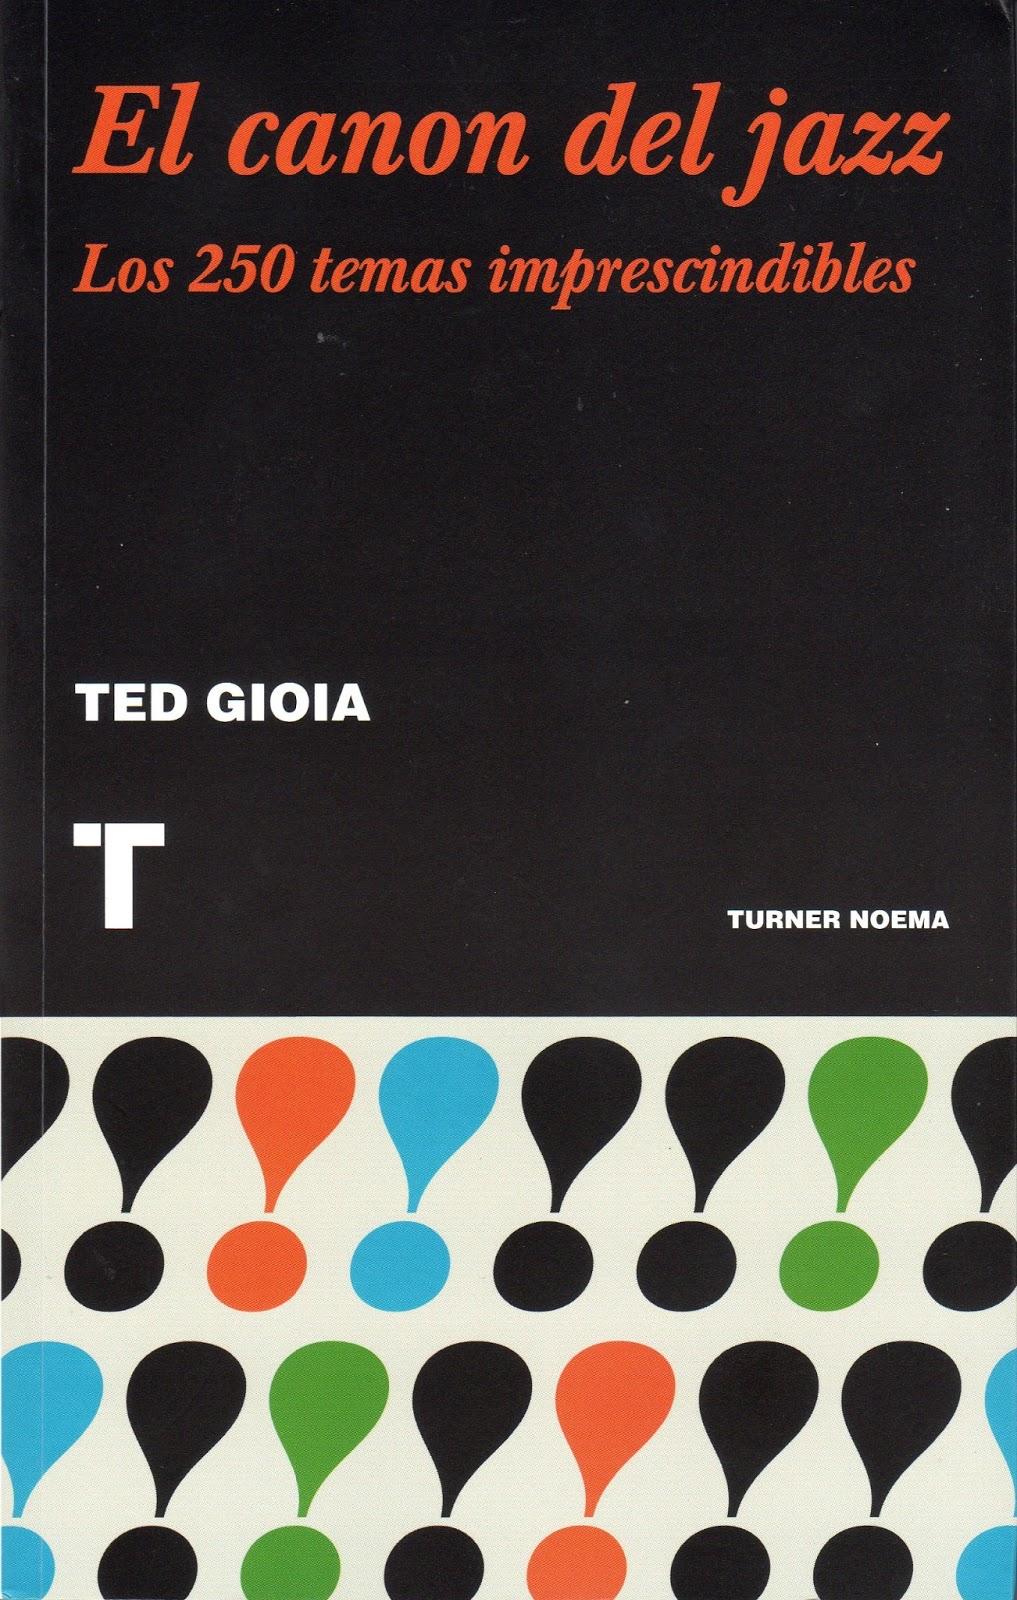 https://3.bp.blogspot.com/-AKHKQLHT4Uo/UdhKGtJDalI/AAAAAAAAAZc/PNo7zDu0lOs/s1600/Res13-06-30+Ted+Gioia.jpg